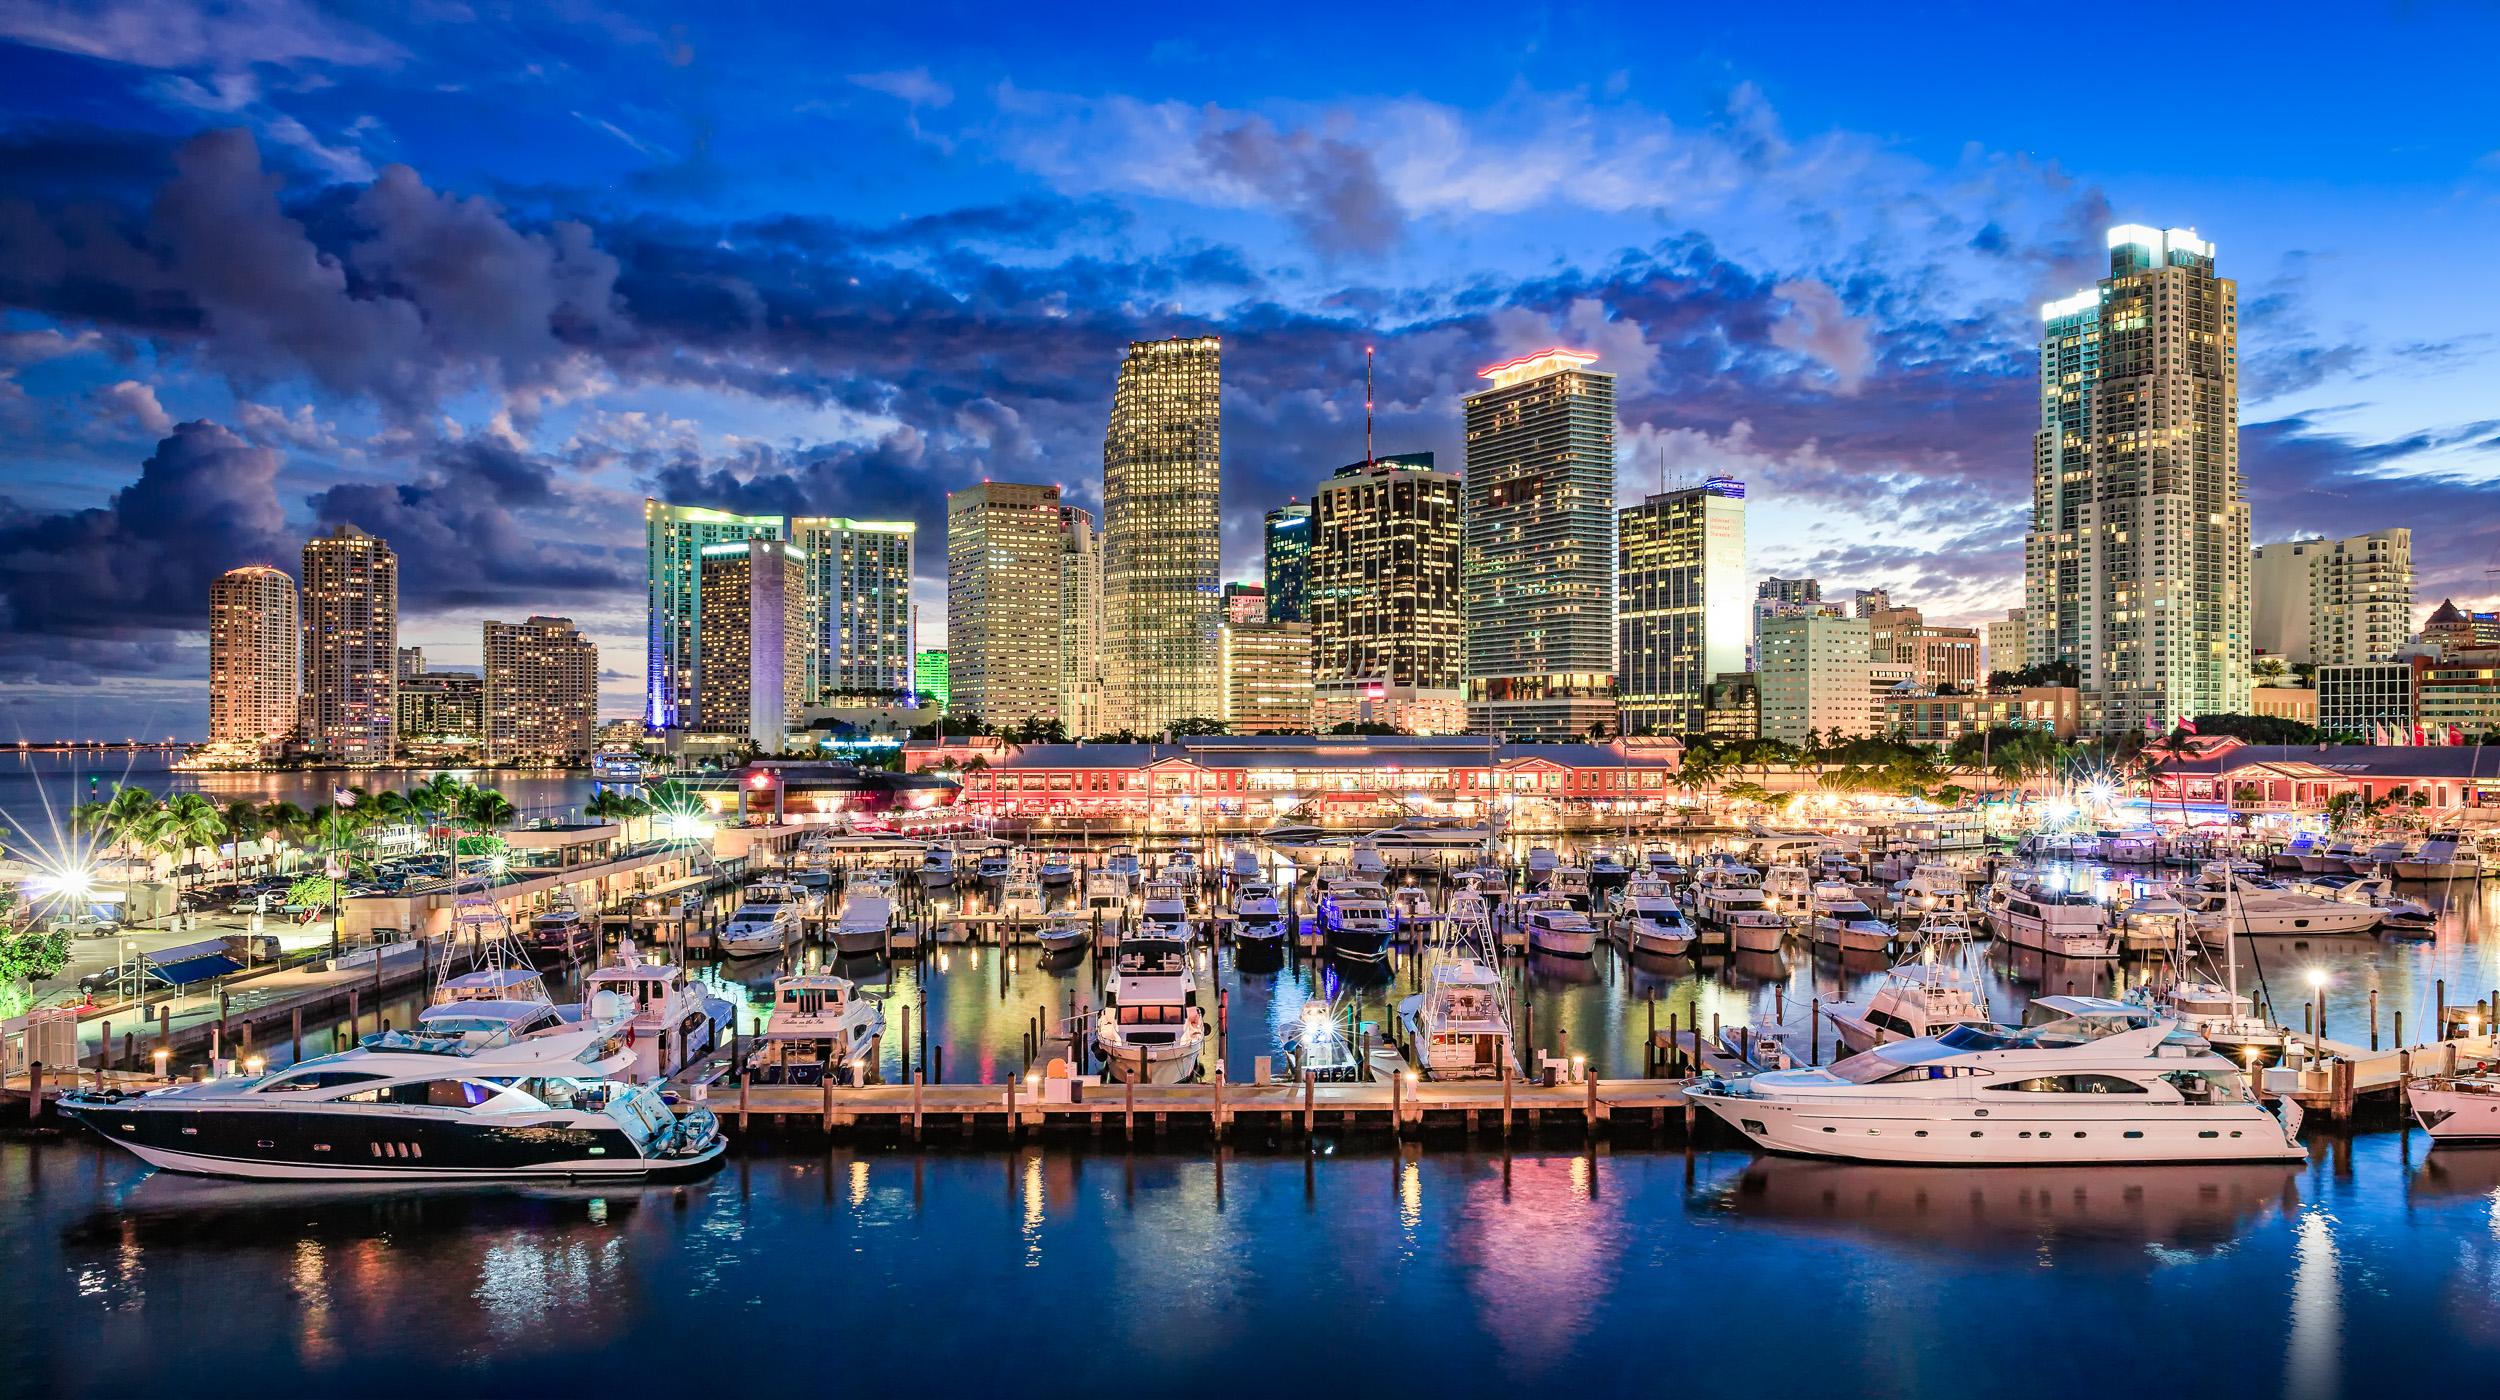 Miami_Downtown_waterfront_night_Miami_Fort_Lauderdale_commercial_photographer_Franklin_Castillo-Edit-Edit-Edit.jpg